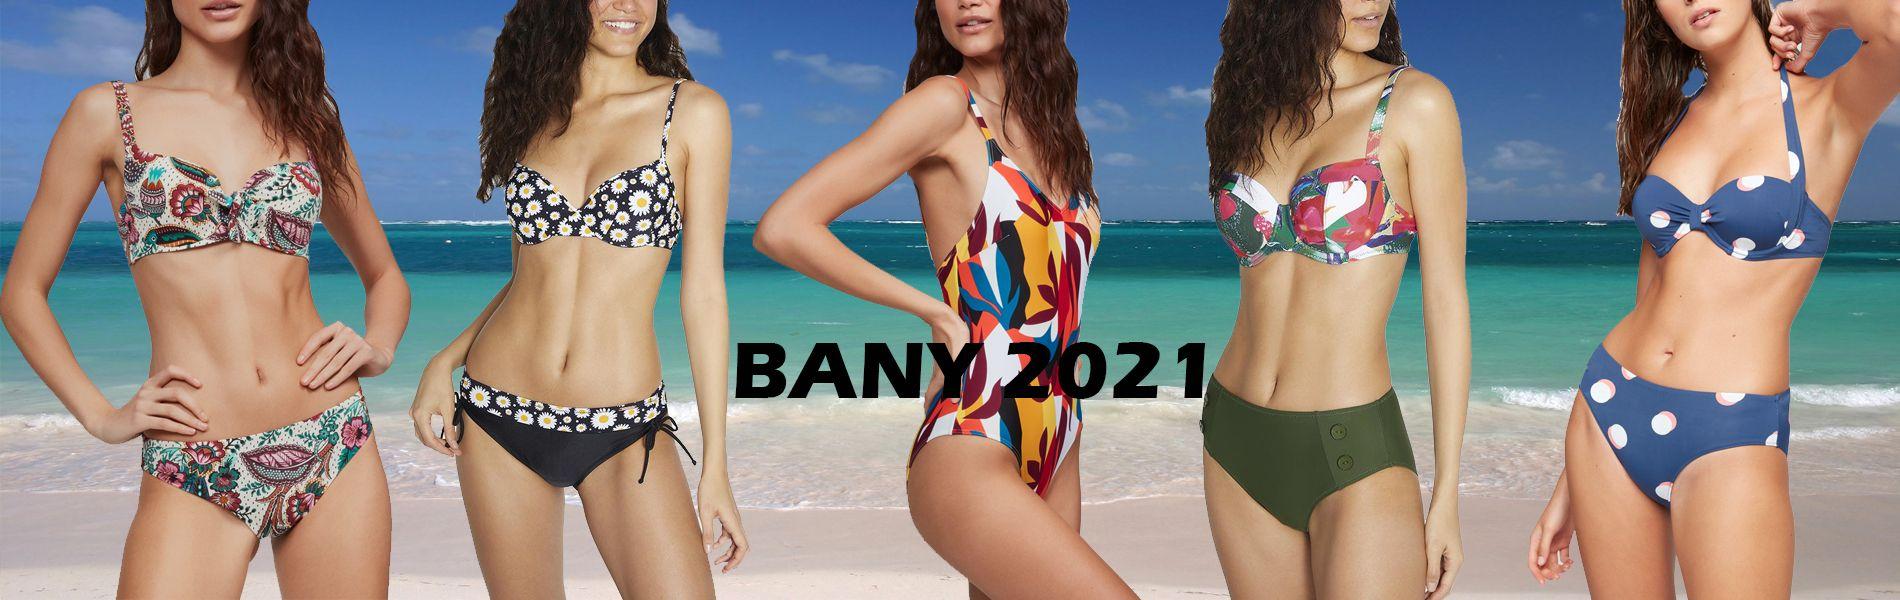 BANY 2021